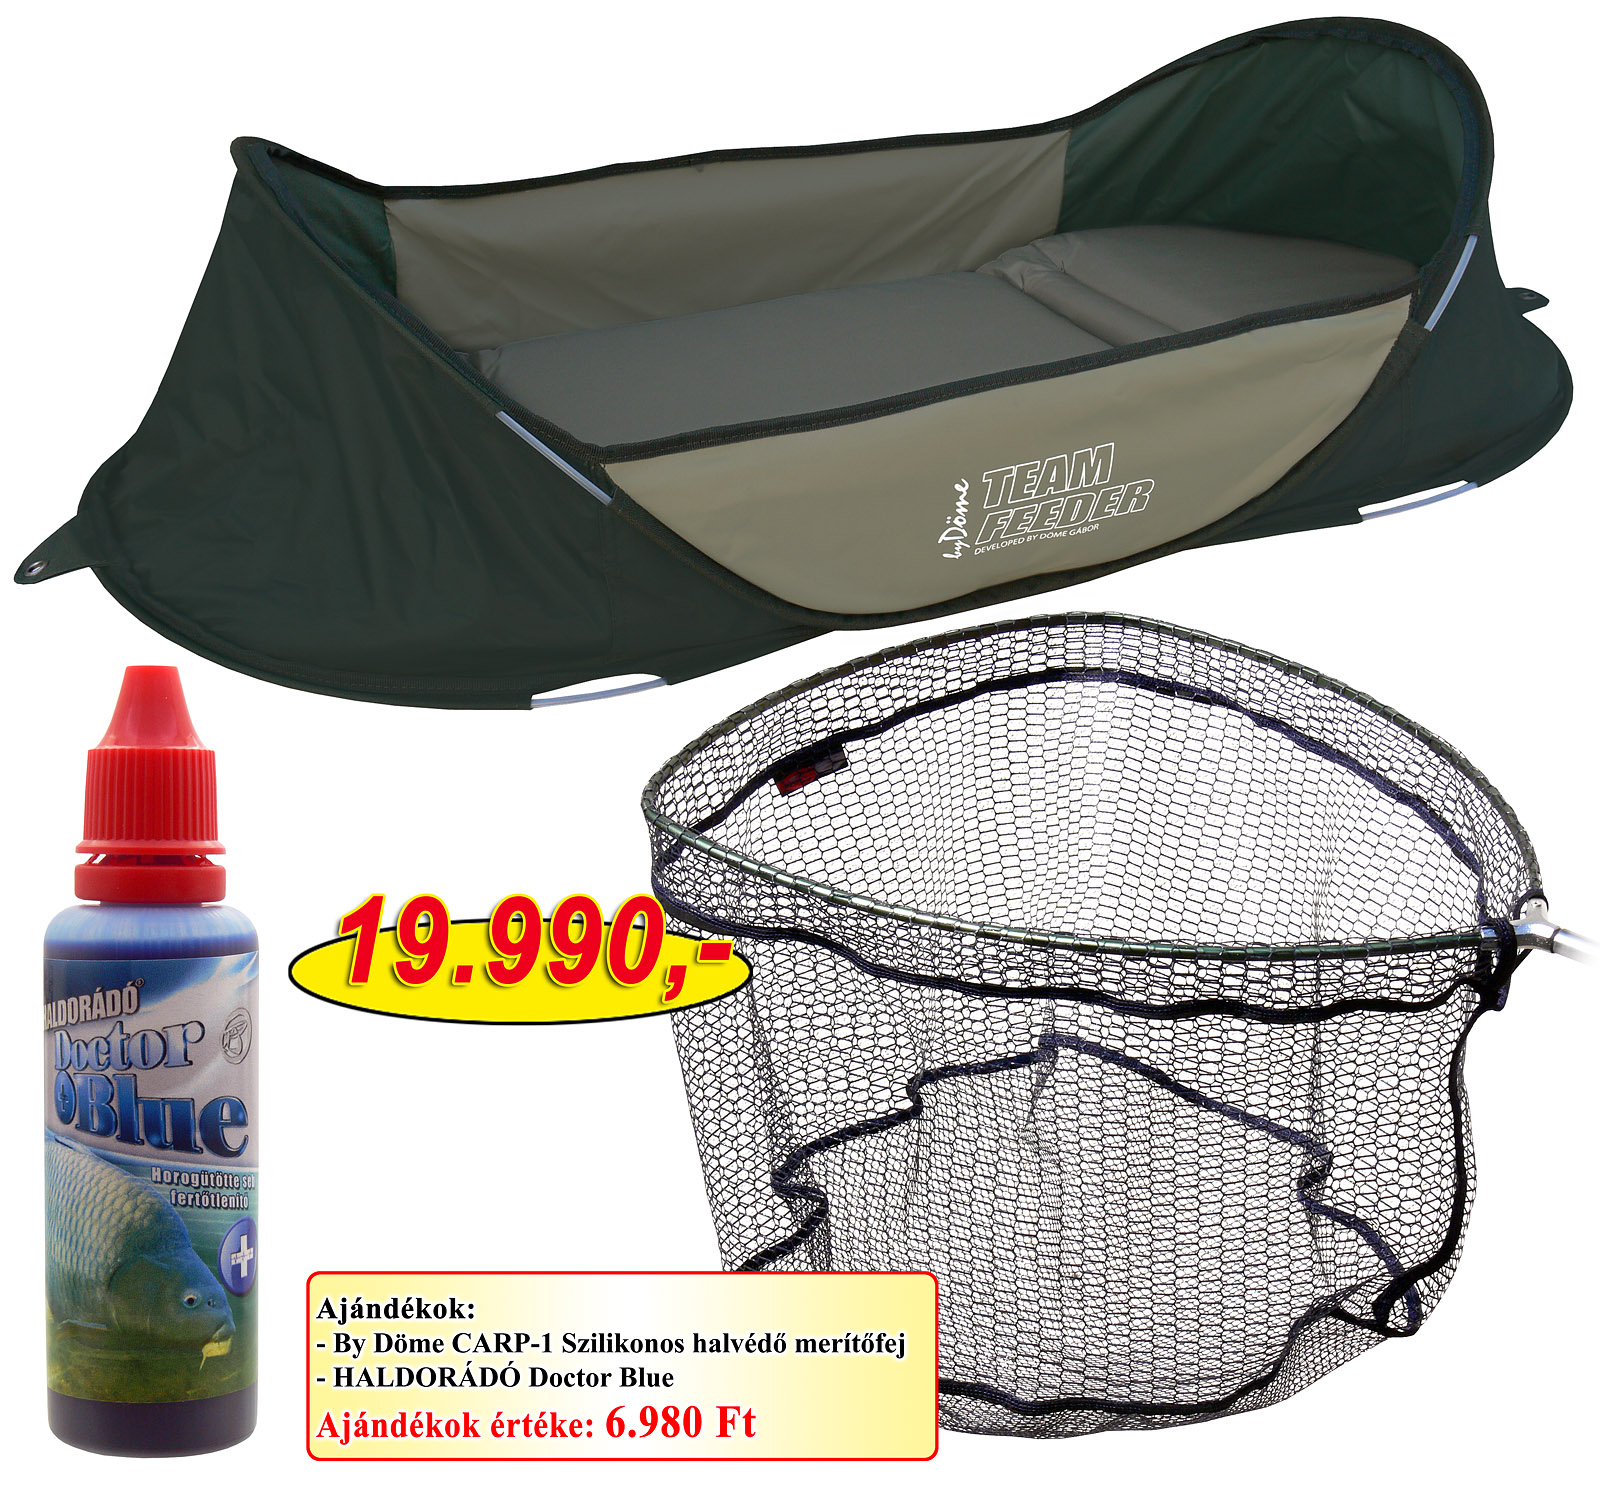 Haldorádó Hideg vízi nagyhalas csomag + ajándék vödör